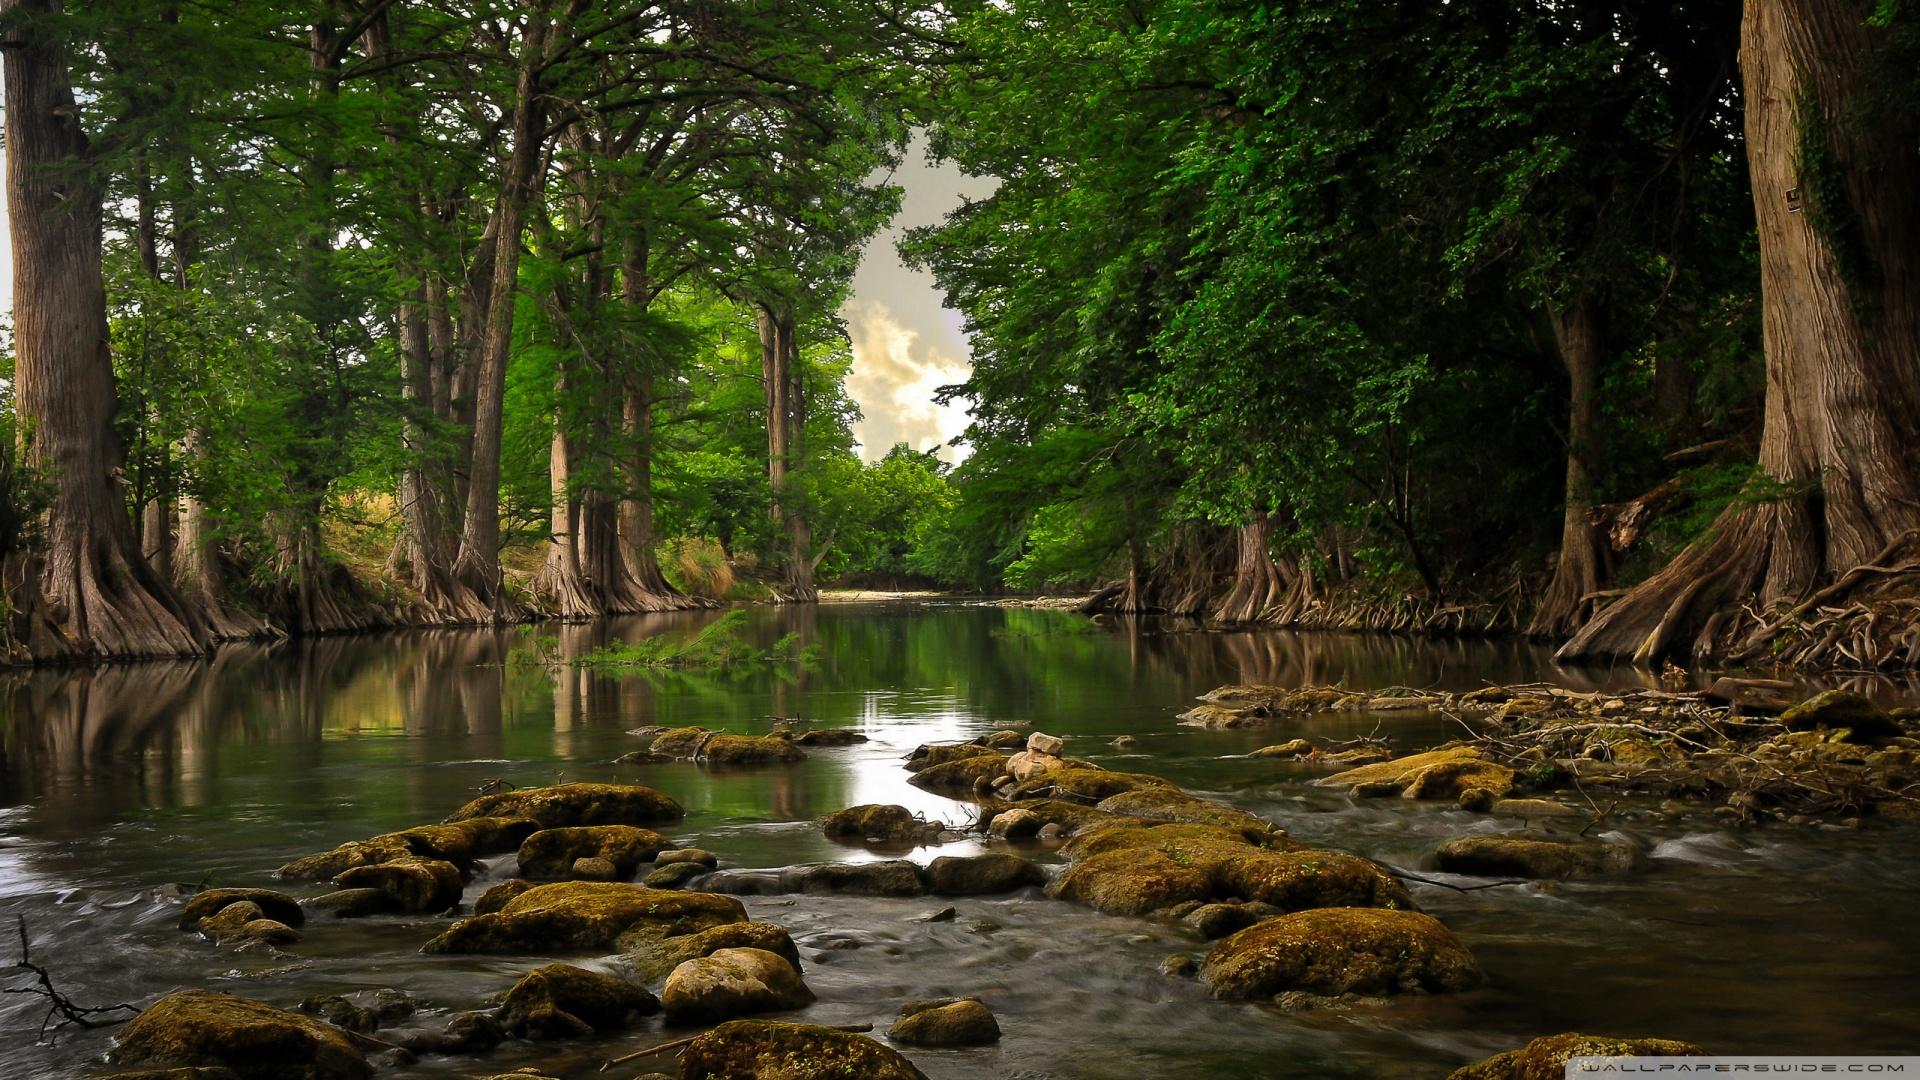 Near the river photo